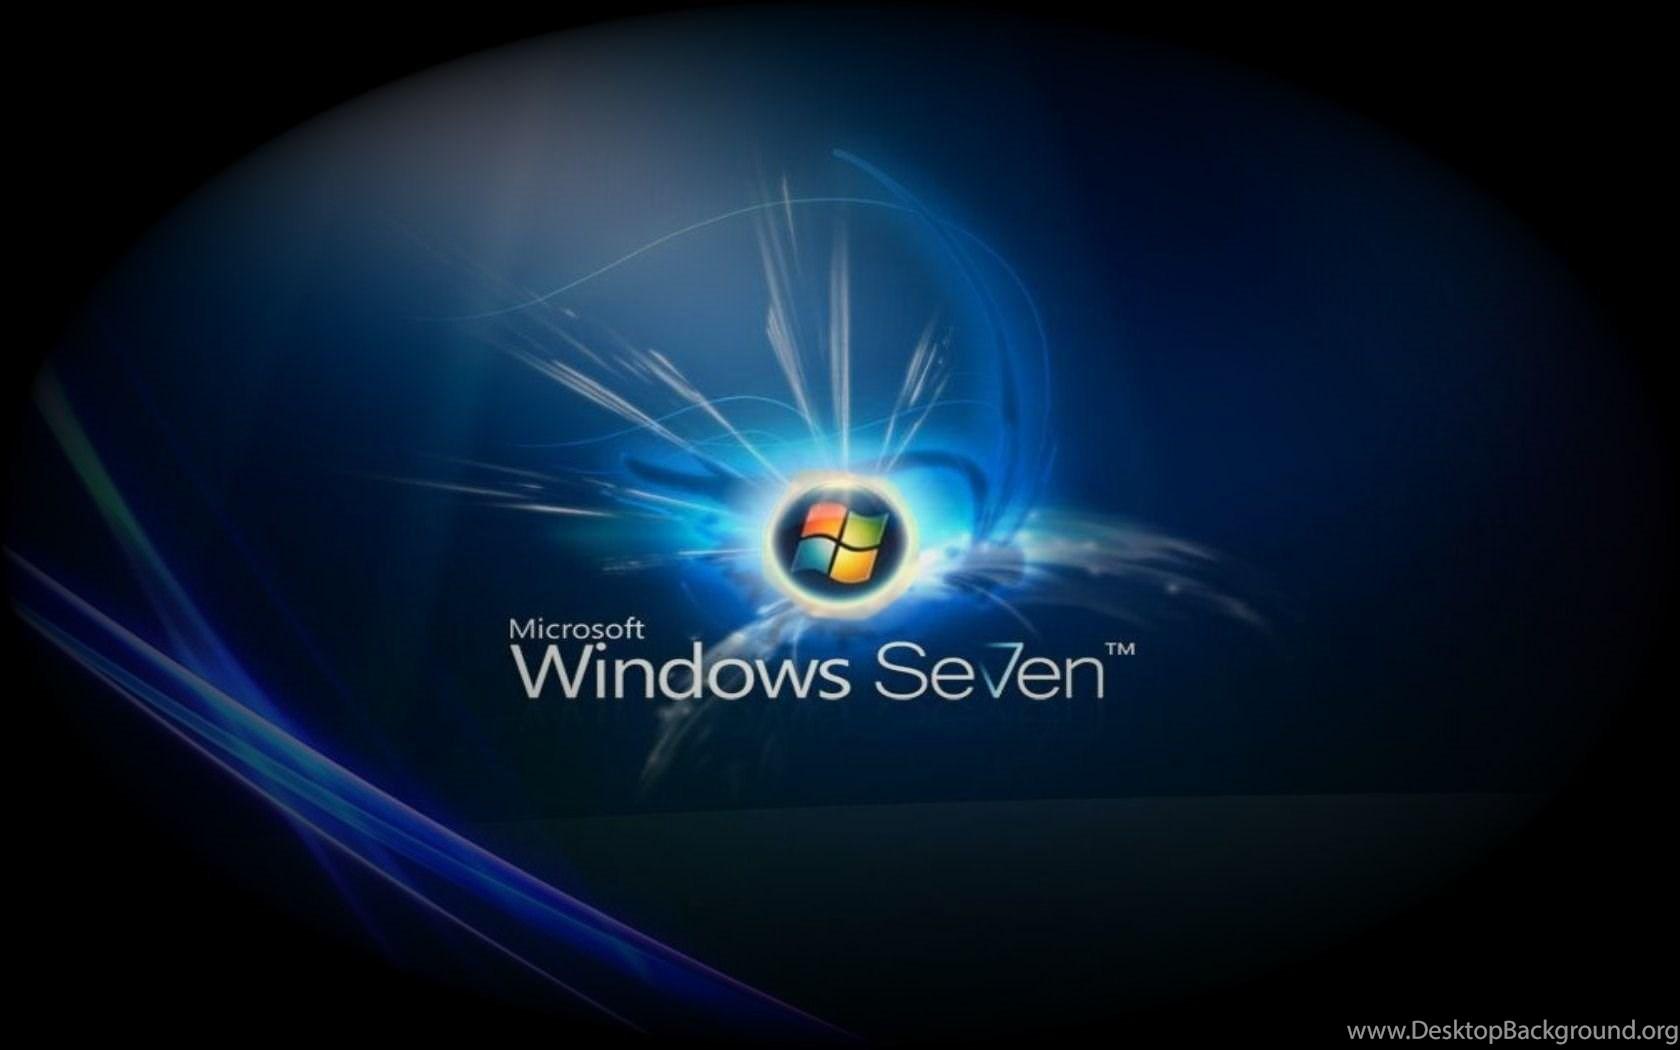 Wallpapers For Windows 7 64 Bit Desktop Background